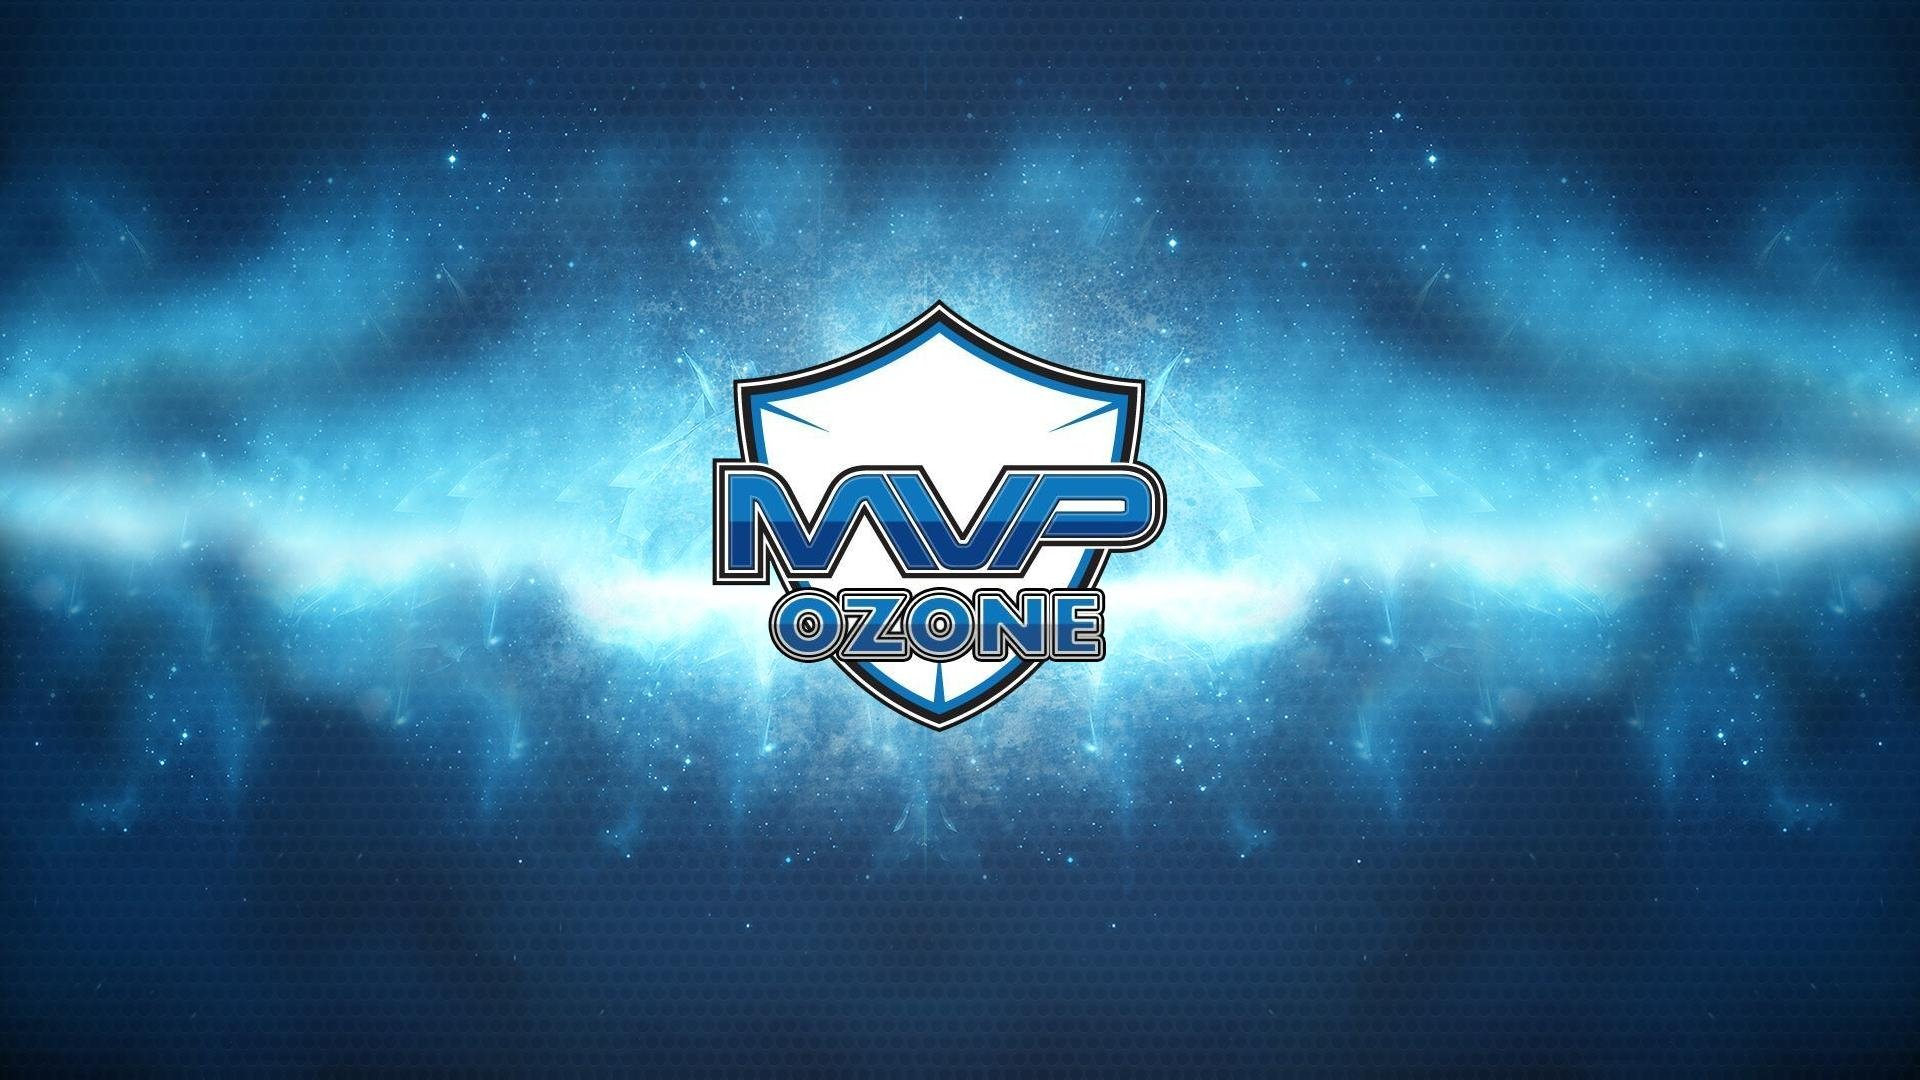 mvp_ozone